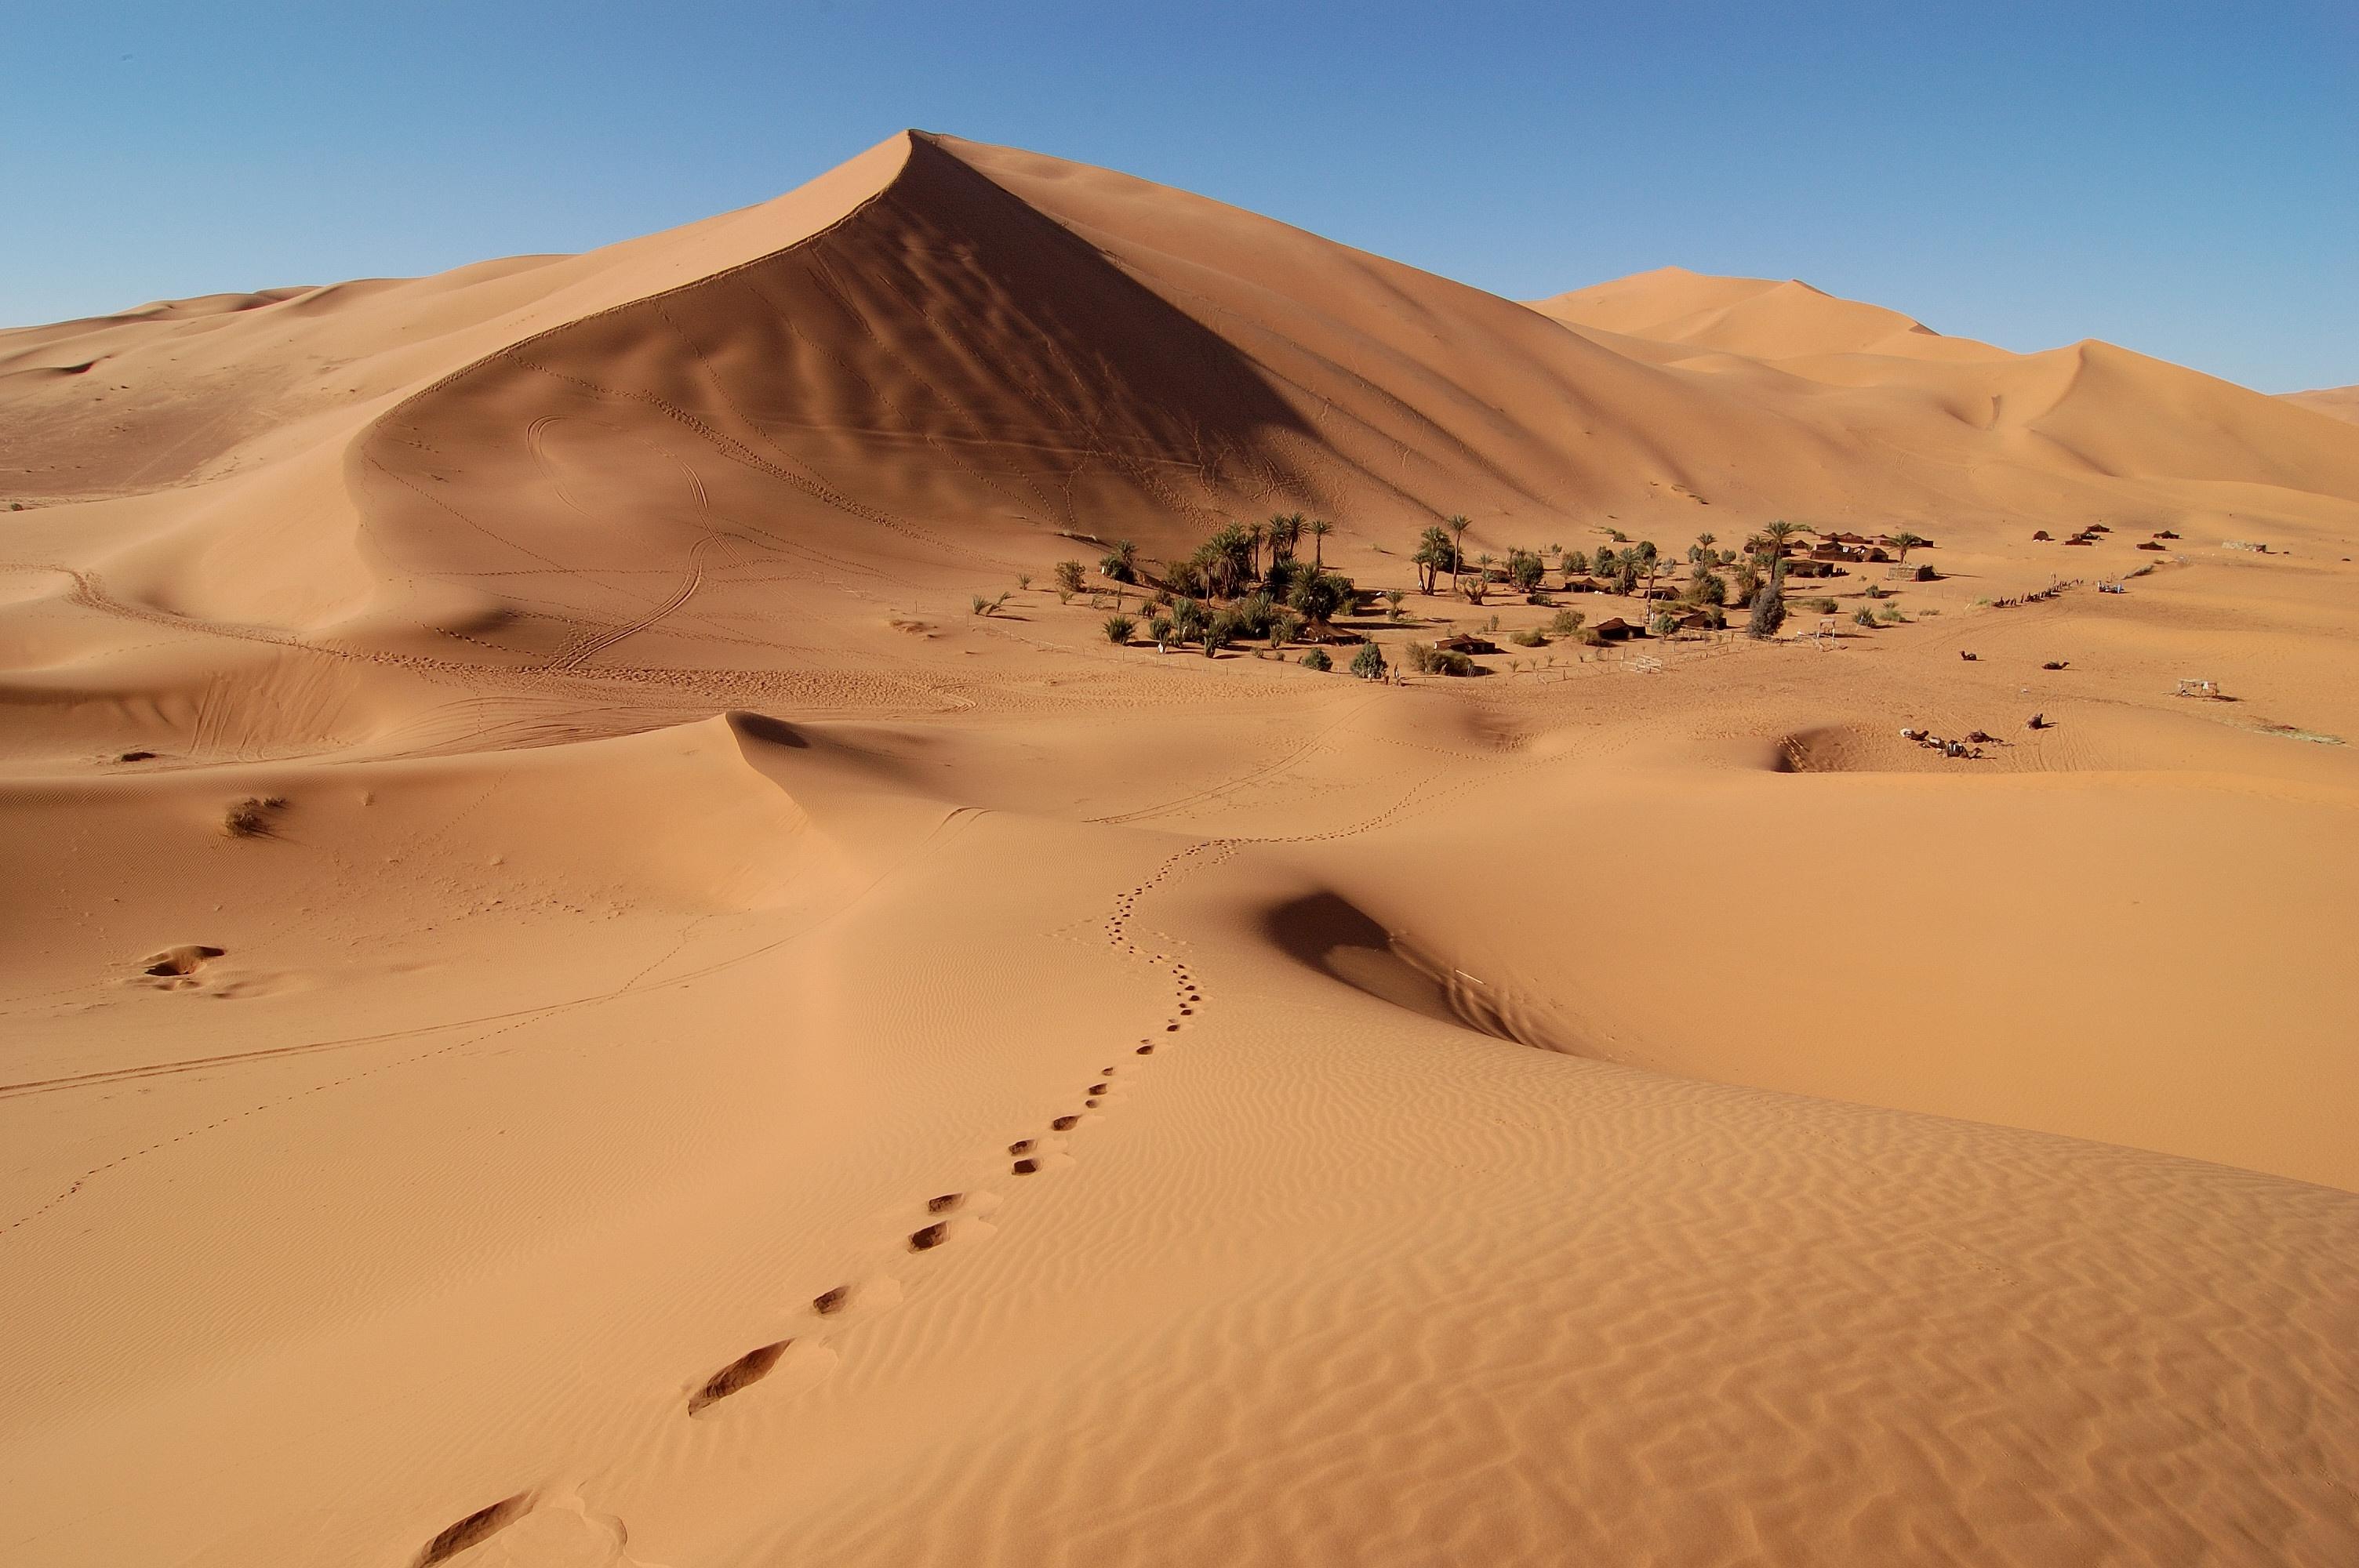 Erg Chebbi Maroc.jpg